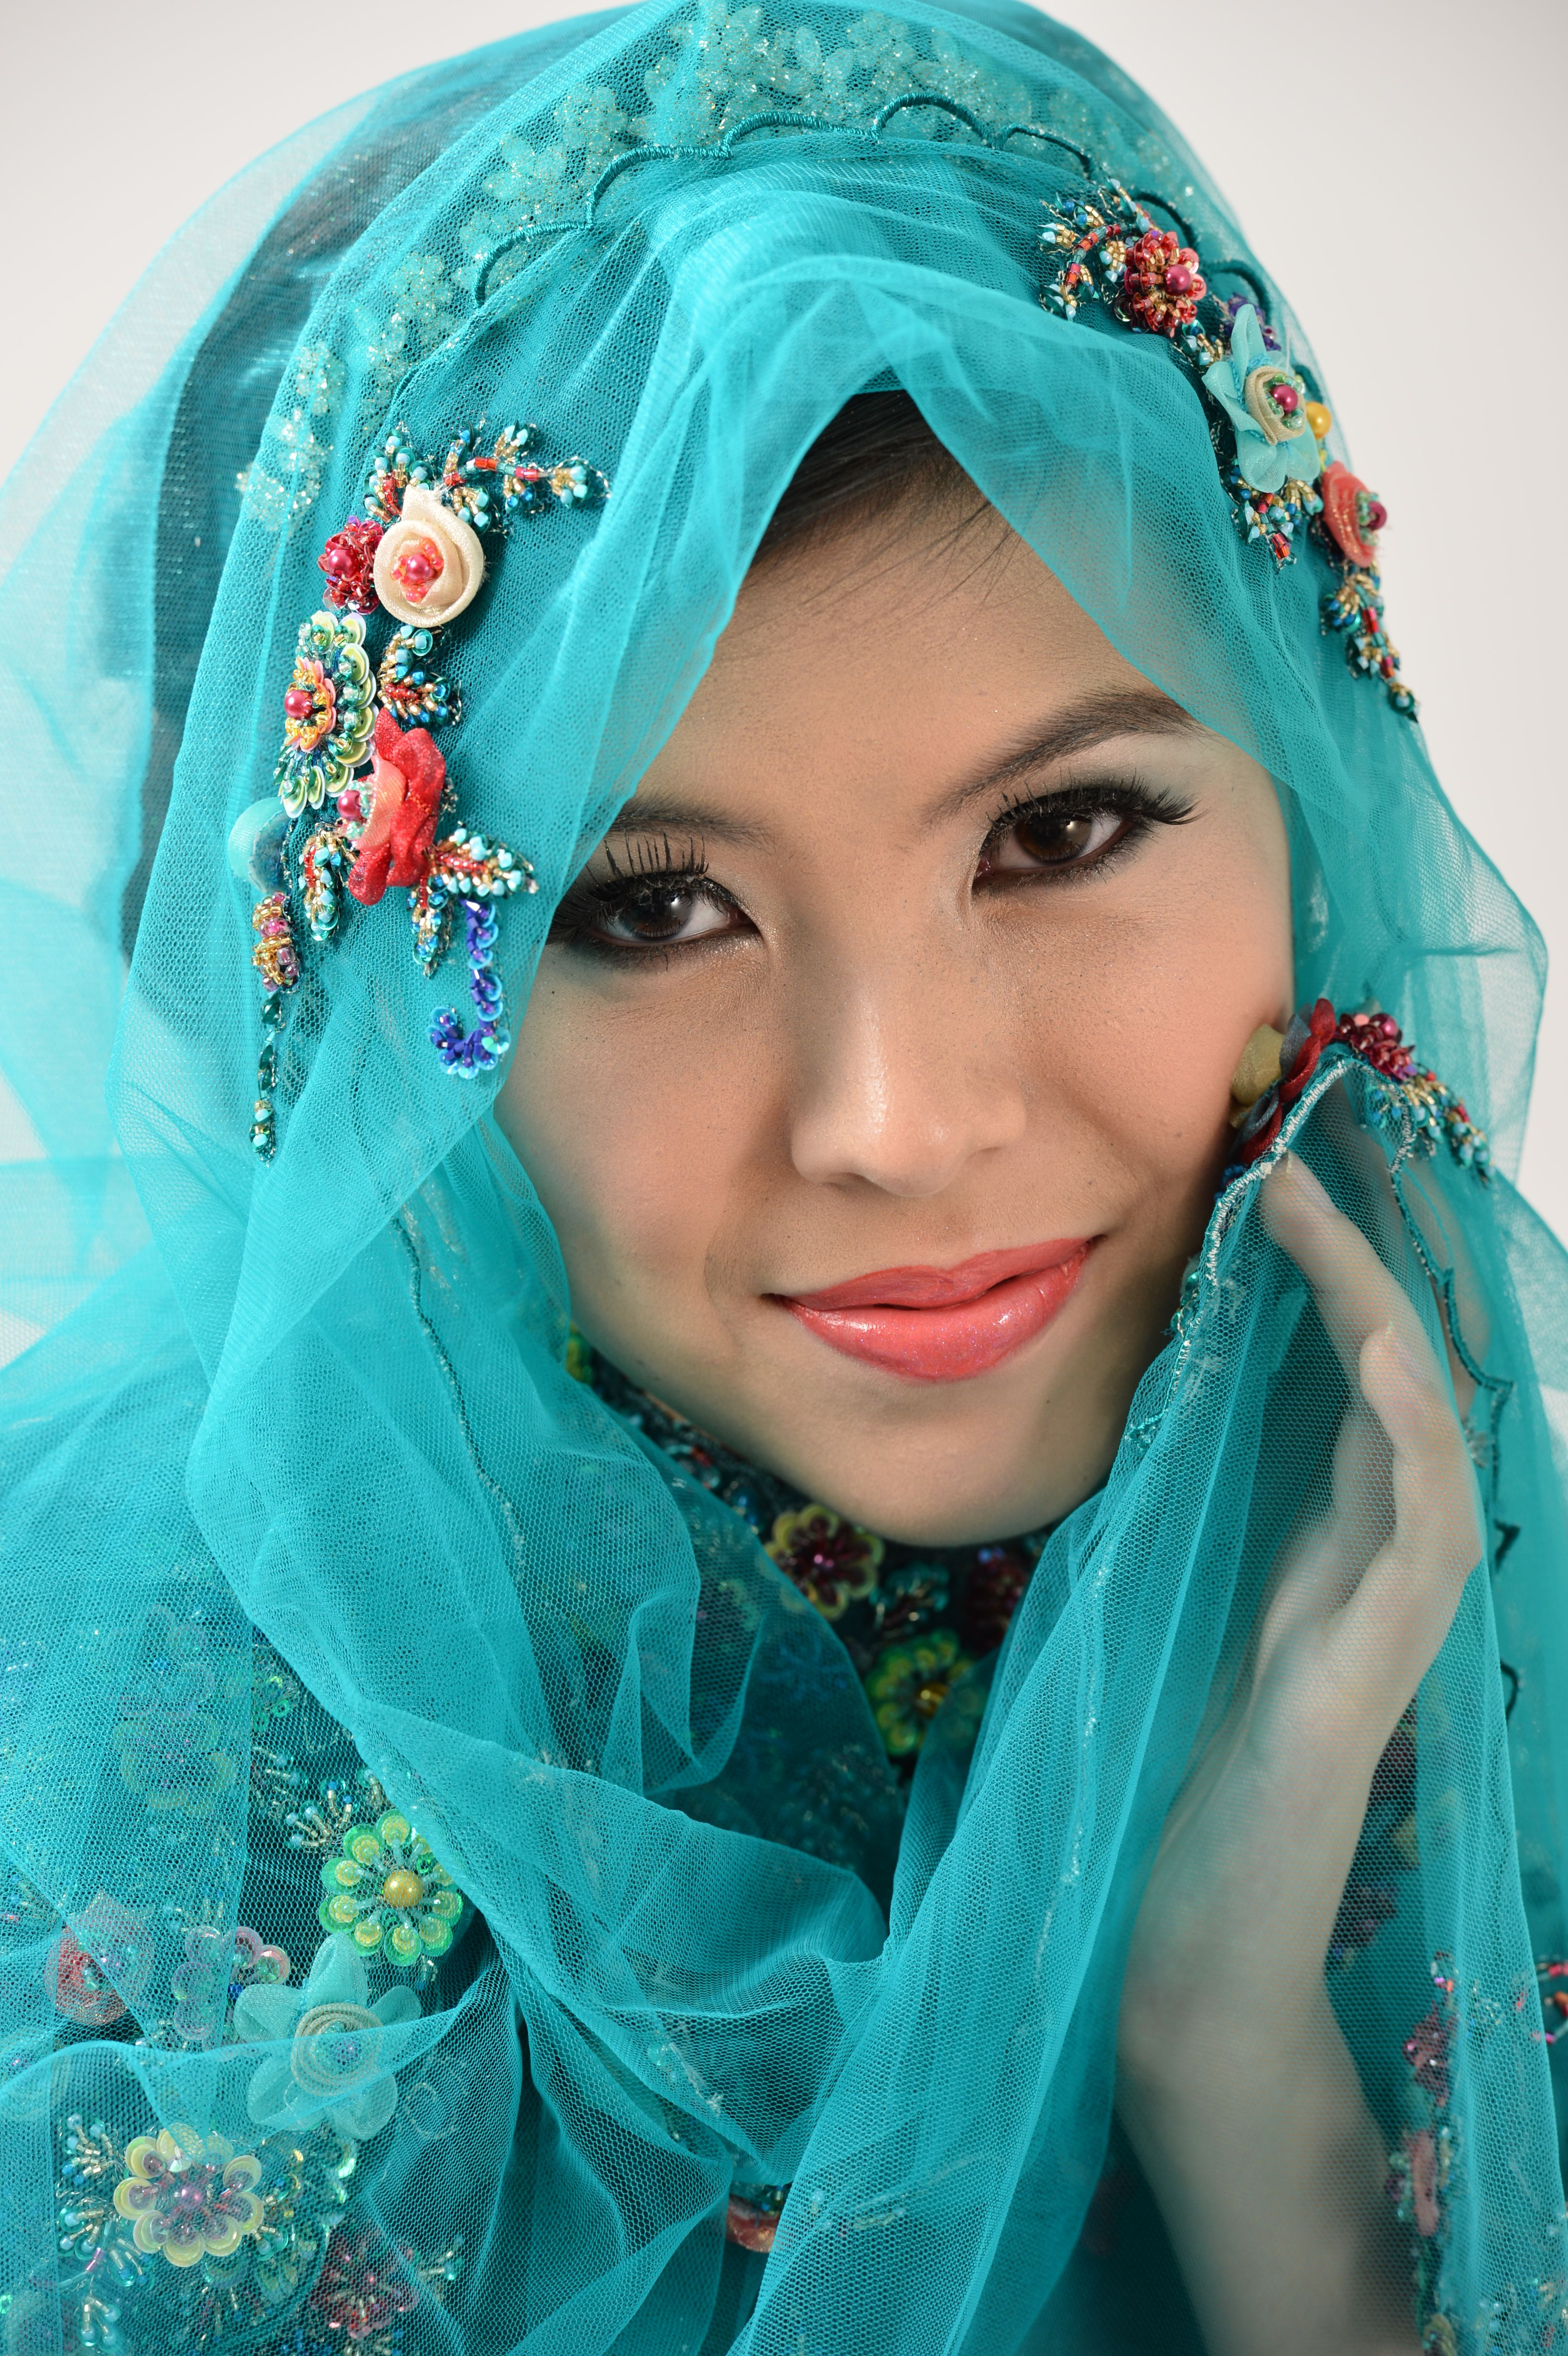 malay bride dress - Google Search | Brides around the world ...